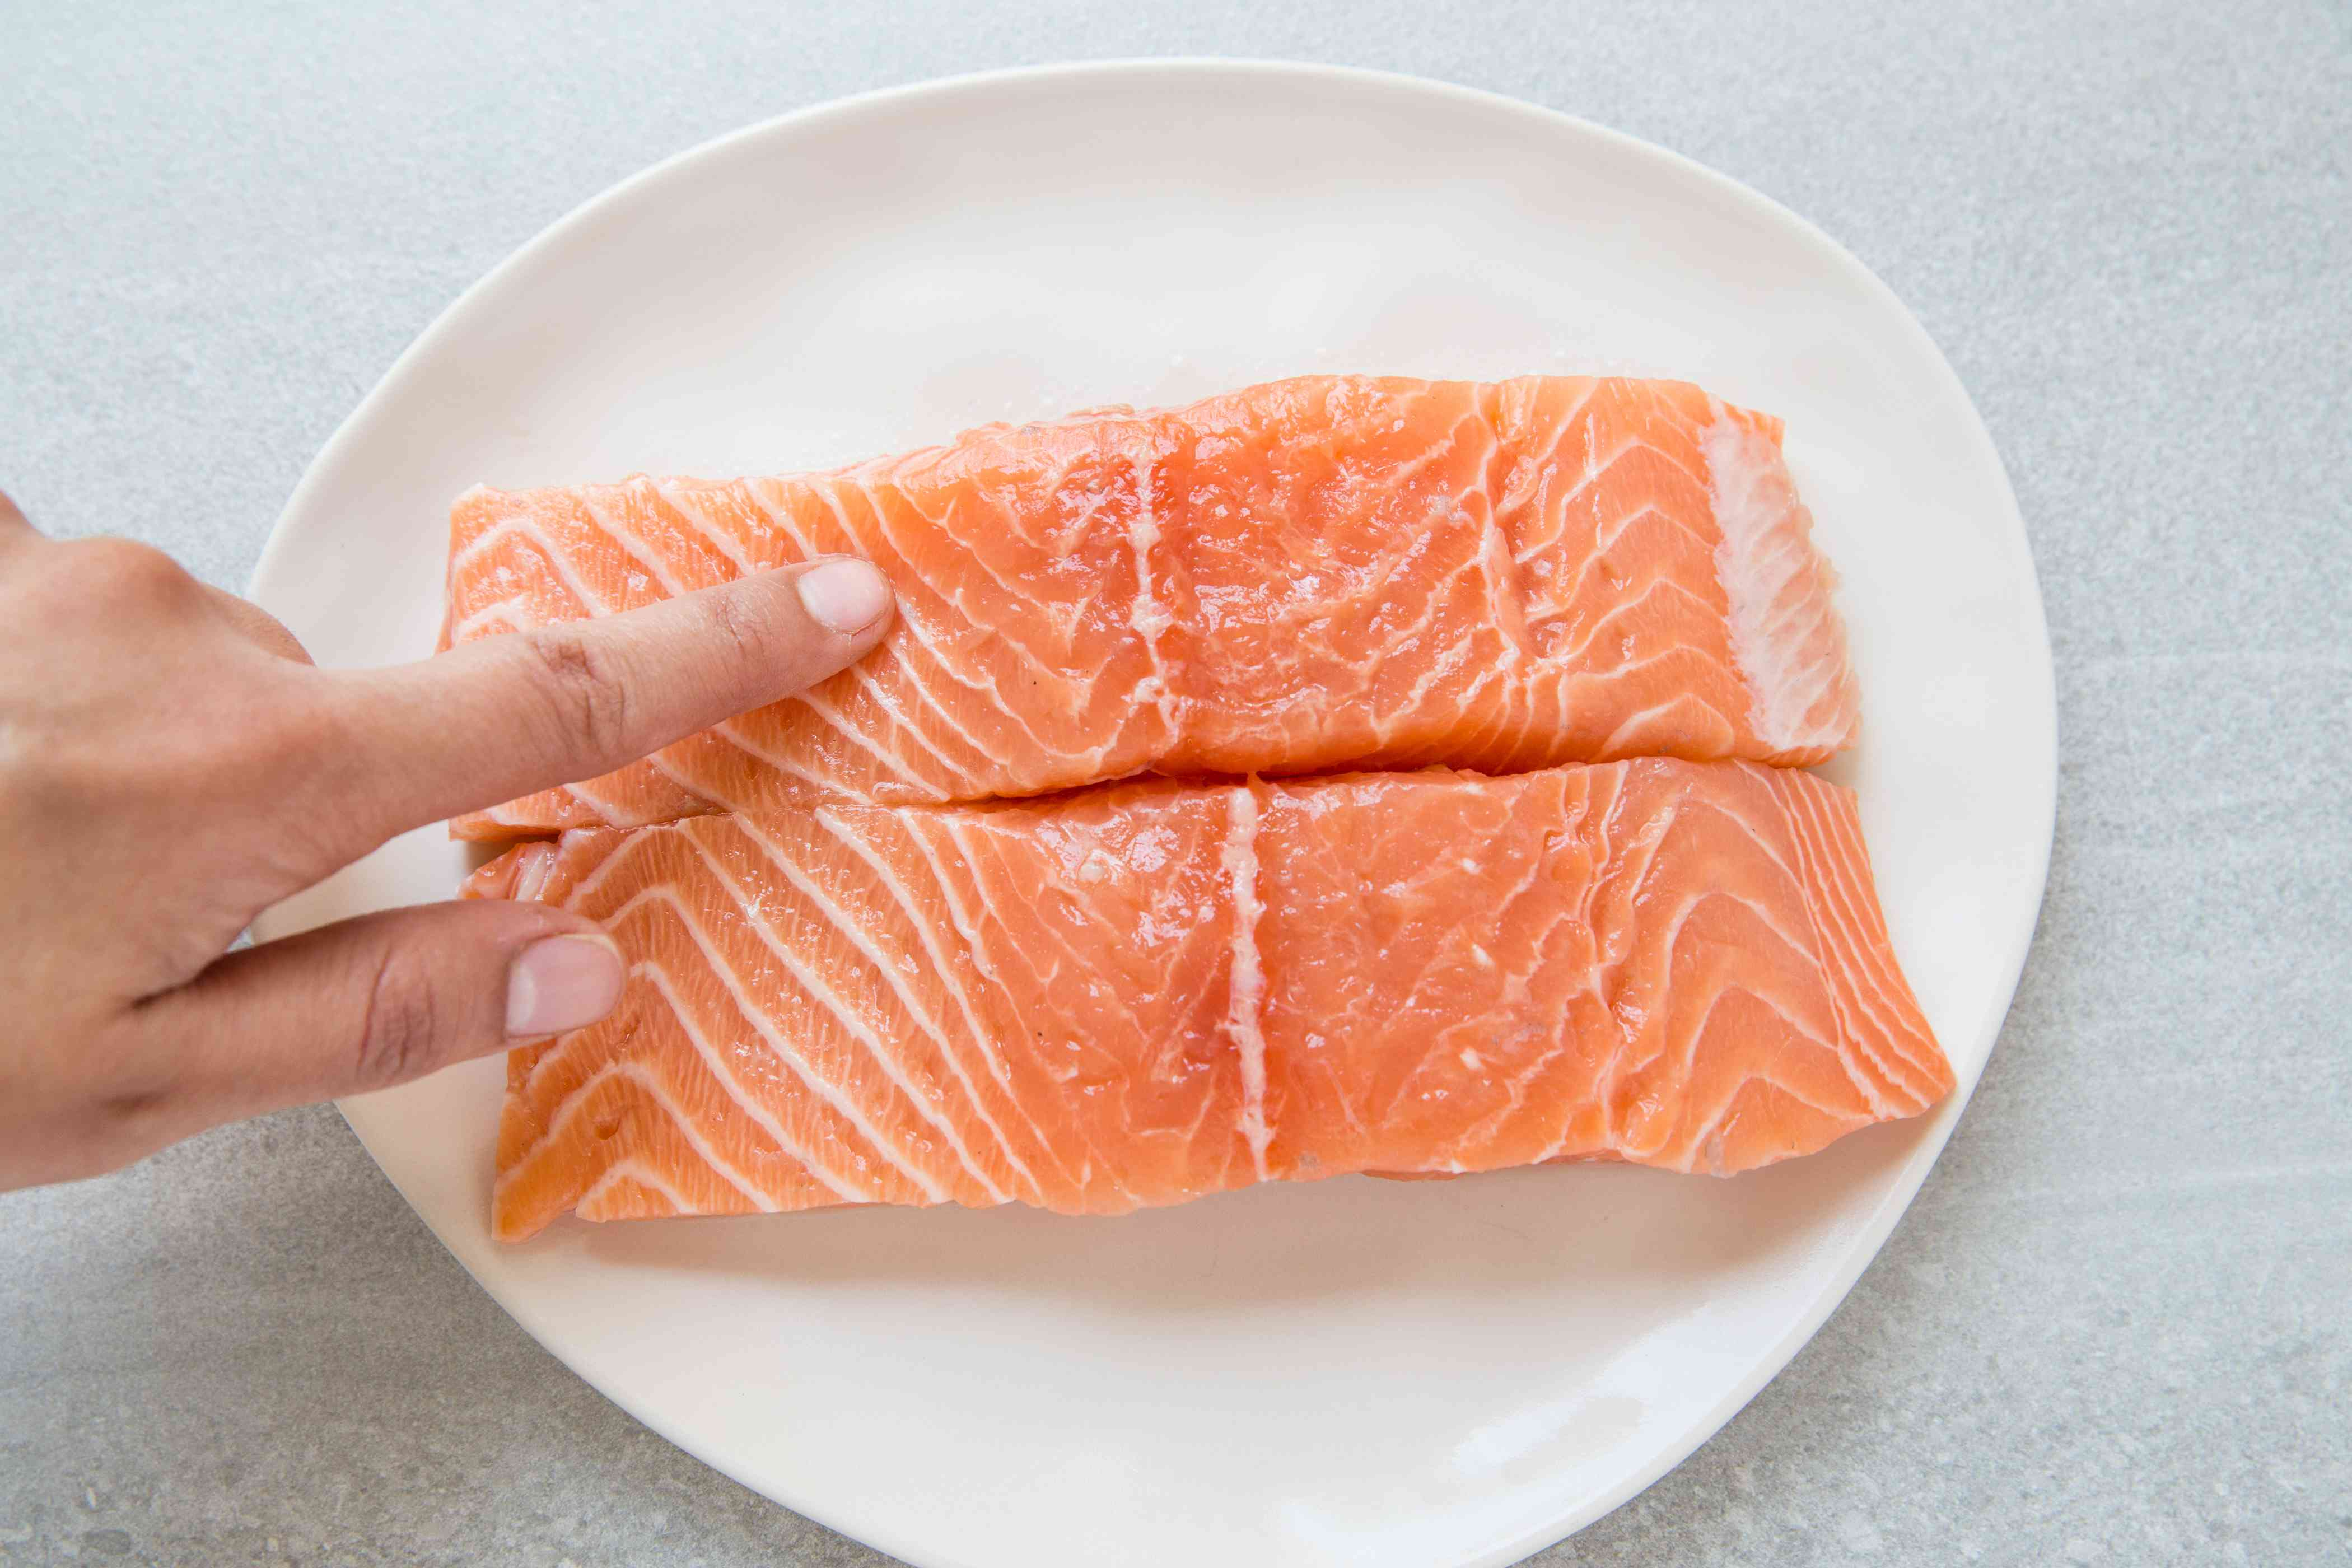 check salmon for pin bones